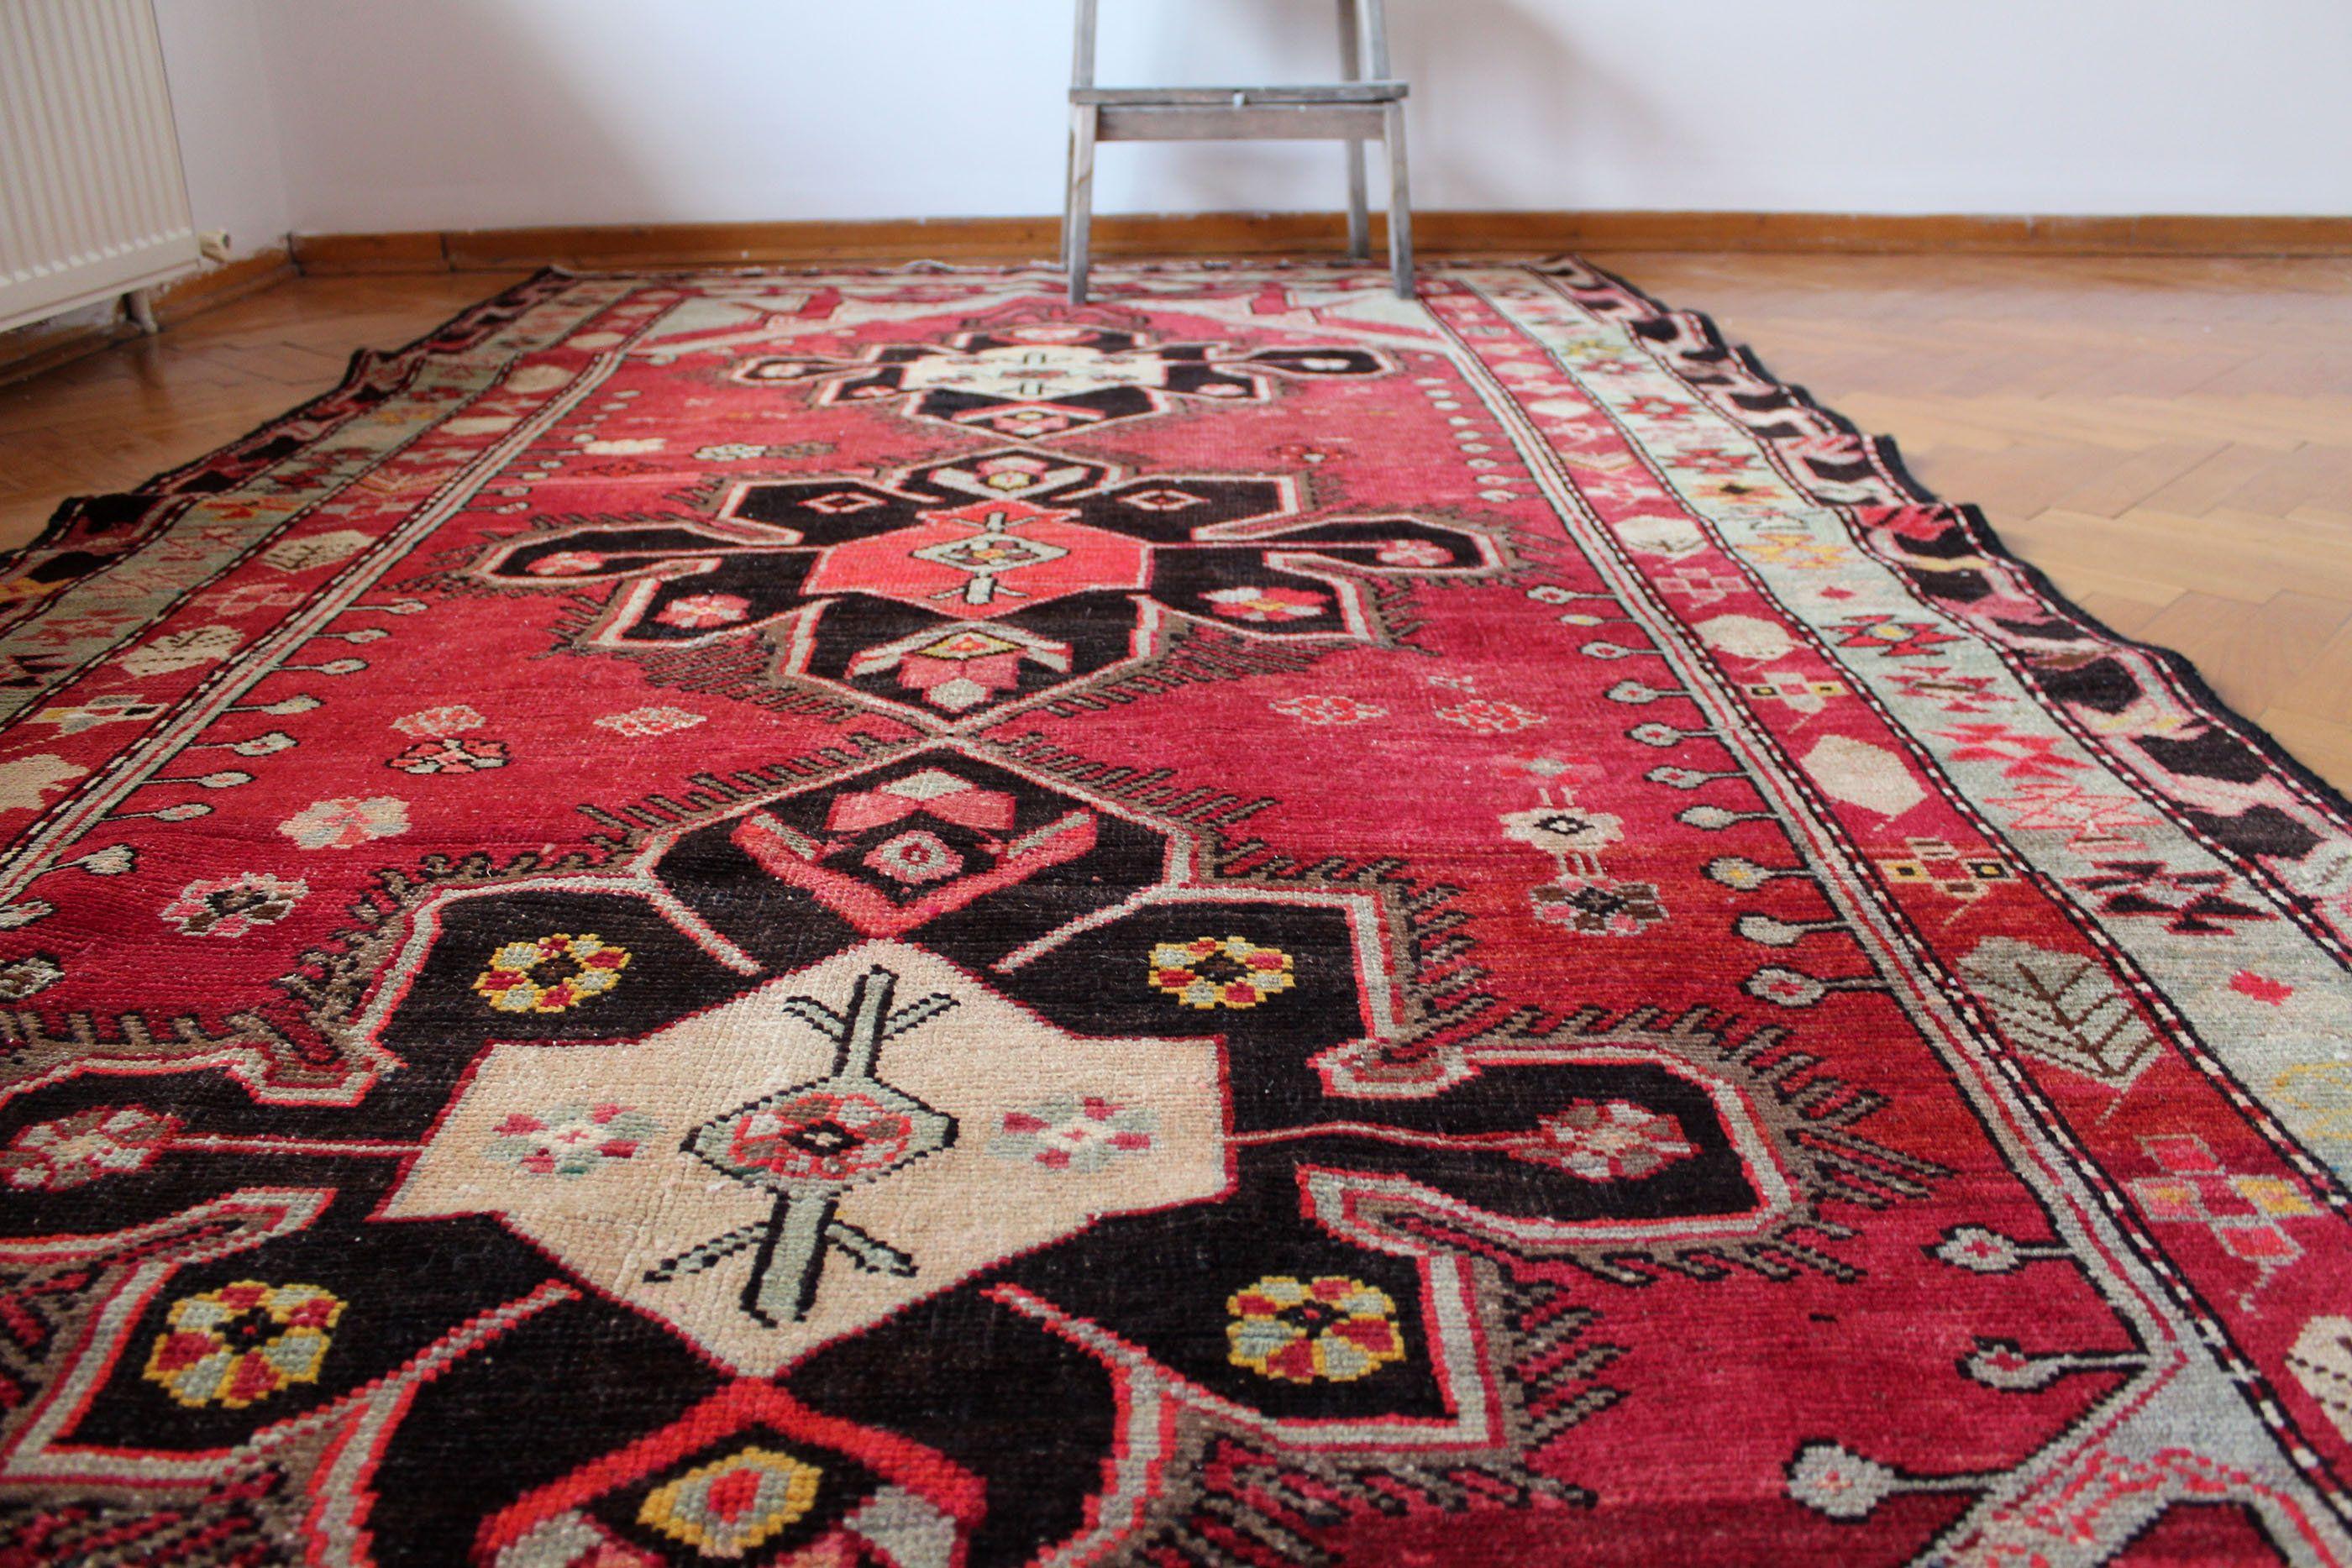 Modern Style Contemporary Rug 8x10 8 X 10 Carpet Rugs Red Beige Swirl Burgundy Rugs On Carpet 8x10 Area Rugs Modern Rugs